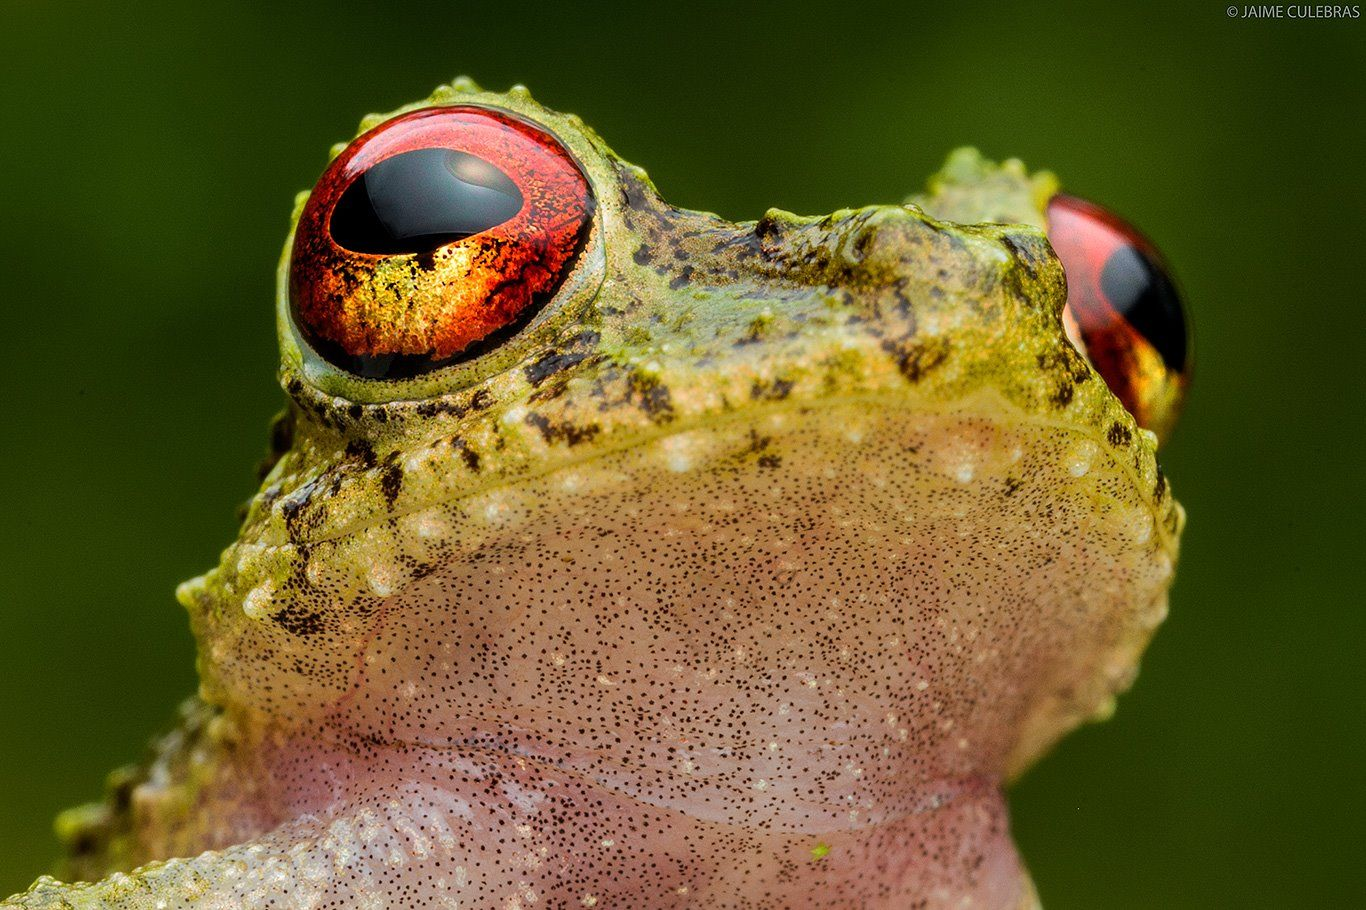 Rainfrog (Pristimantis crucifer, Cutín in Spanish) from Ecuador. ©Jaime Culebras